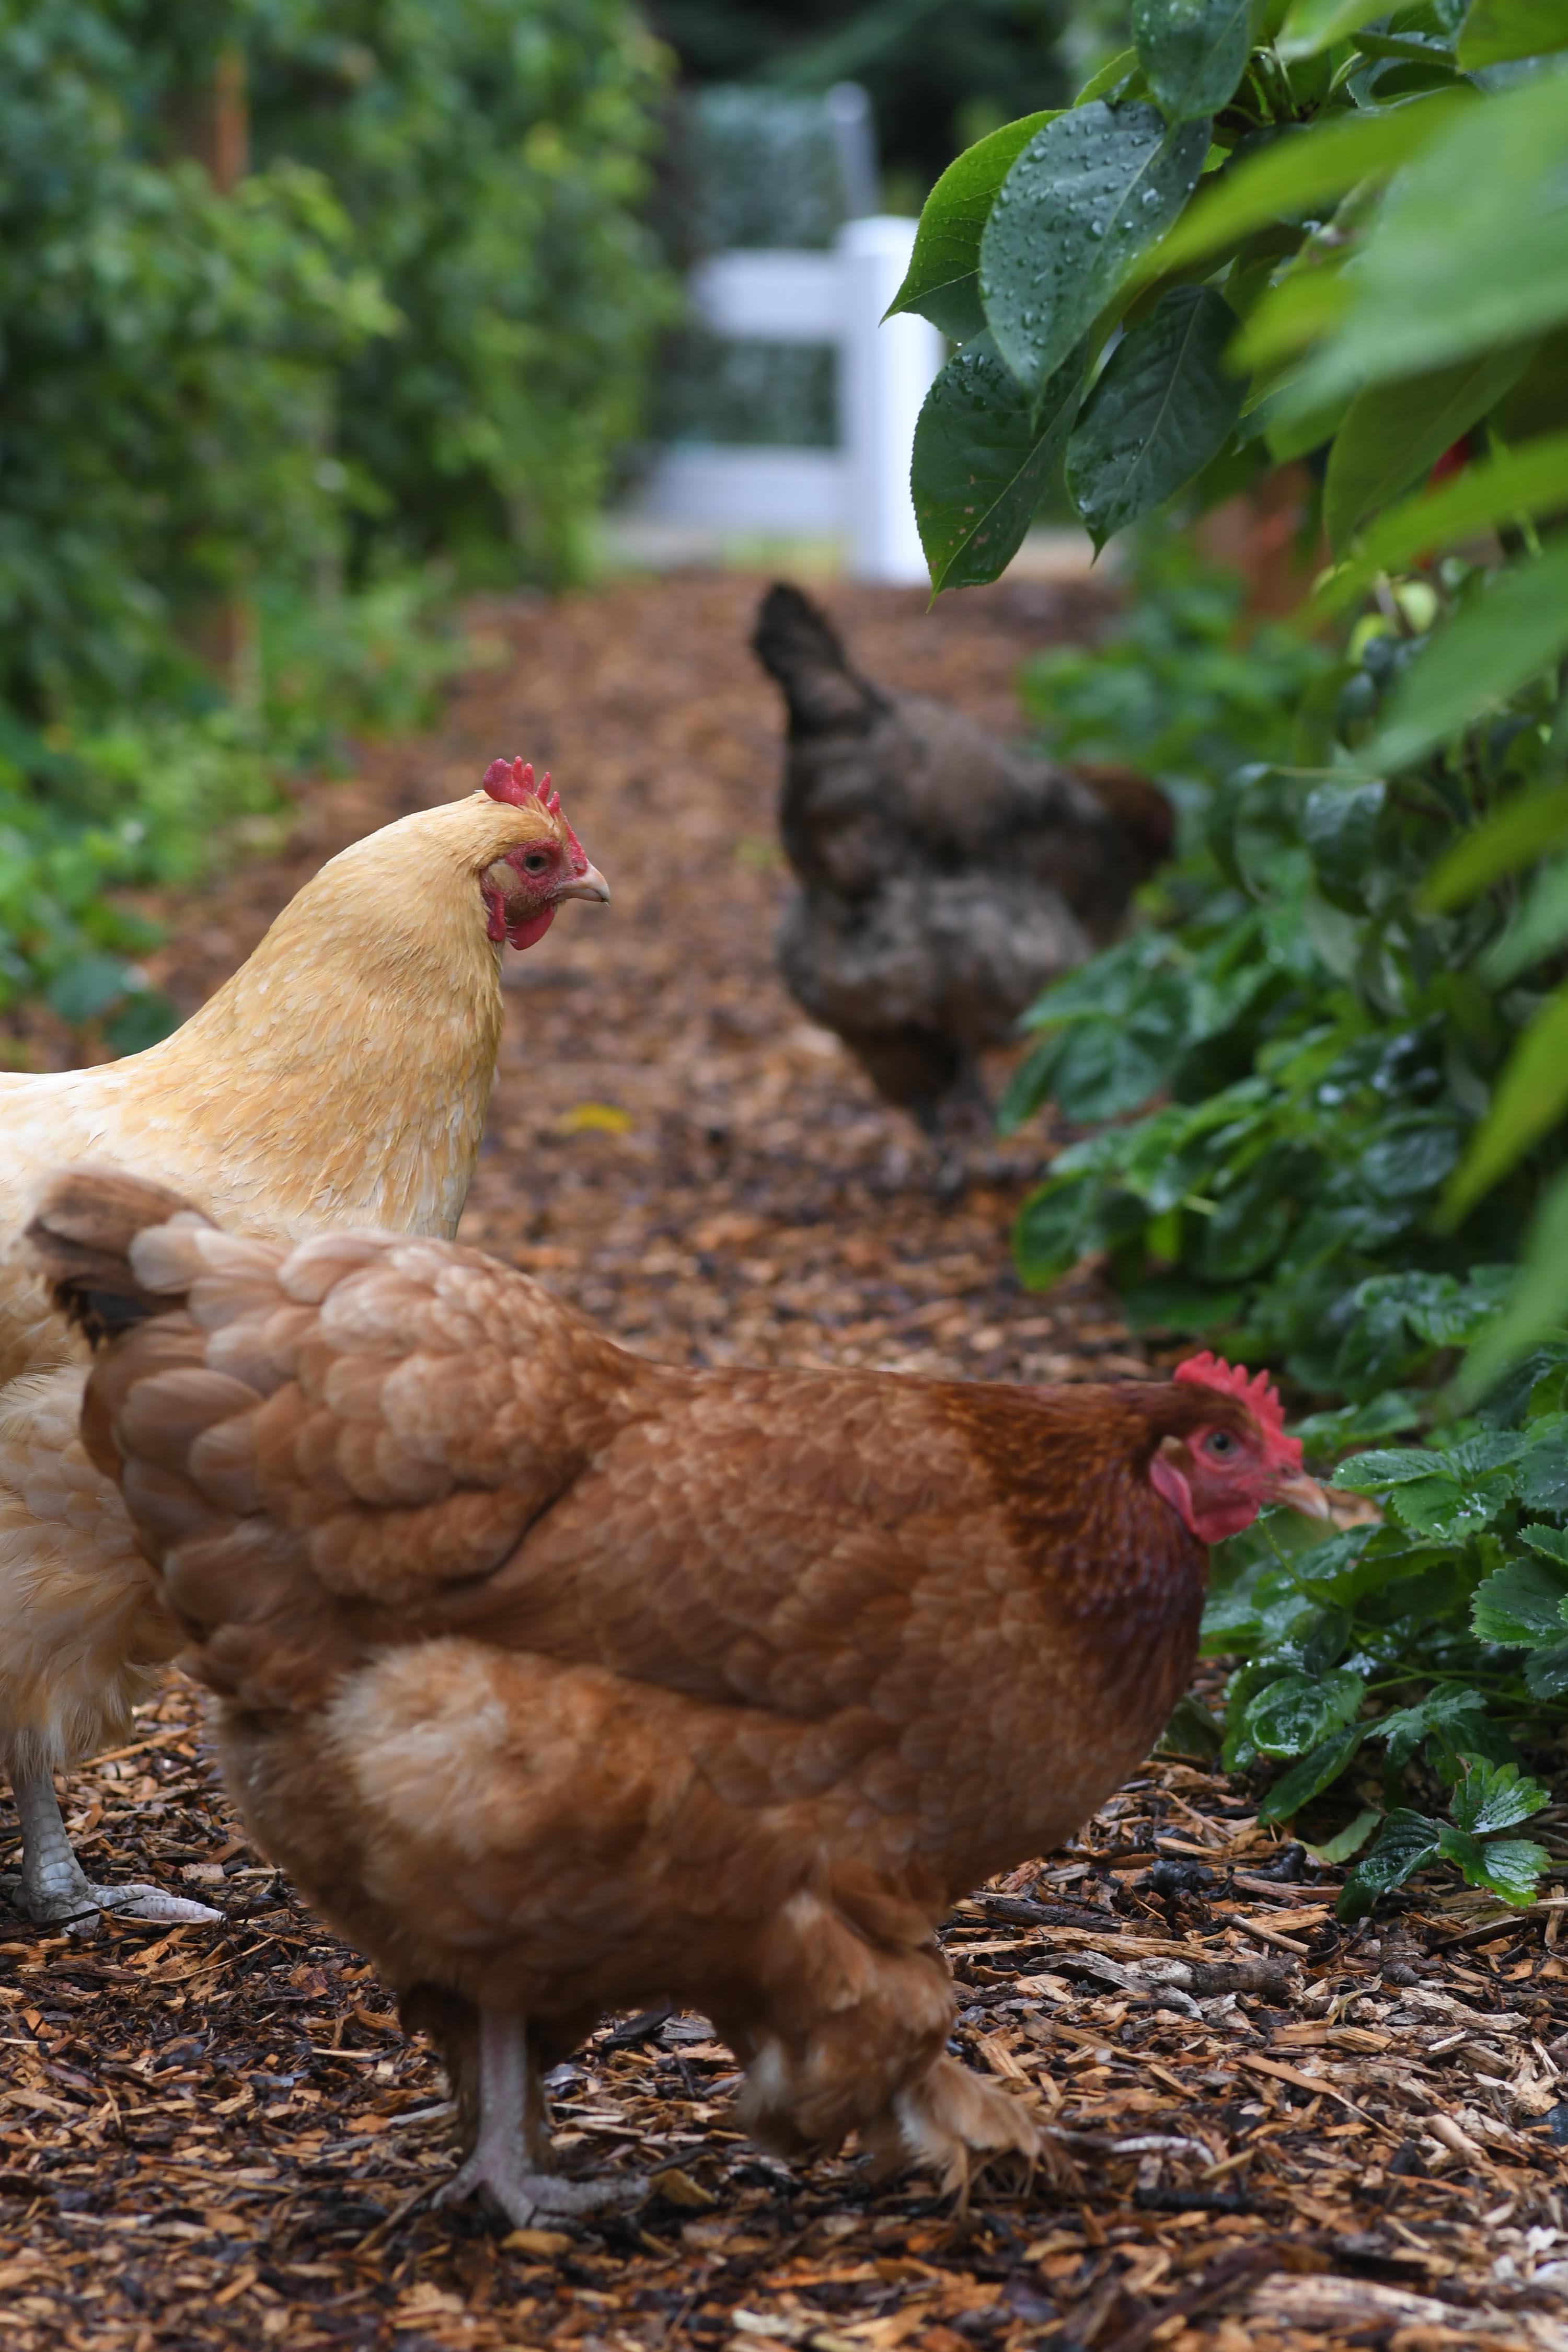 New partnership will convert chicken waste into biogas